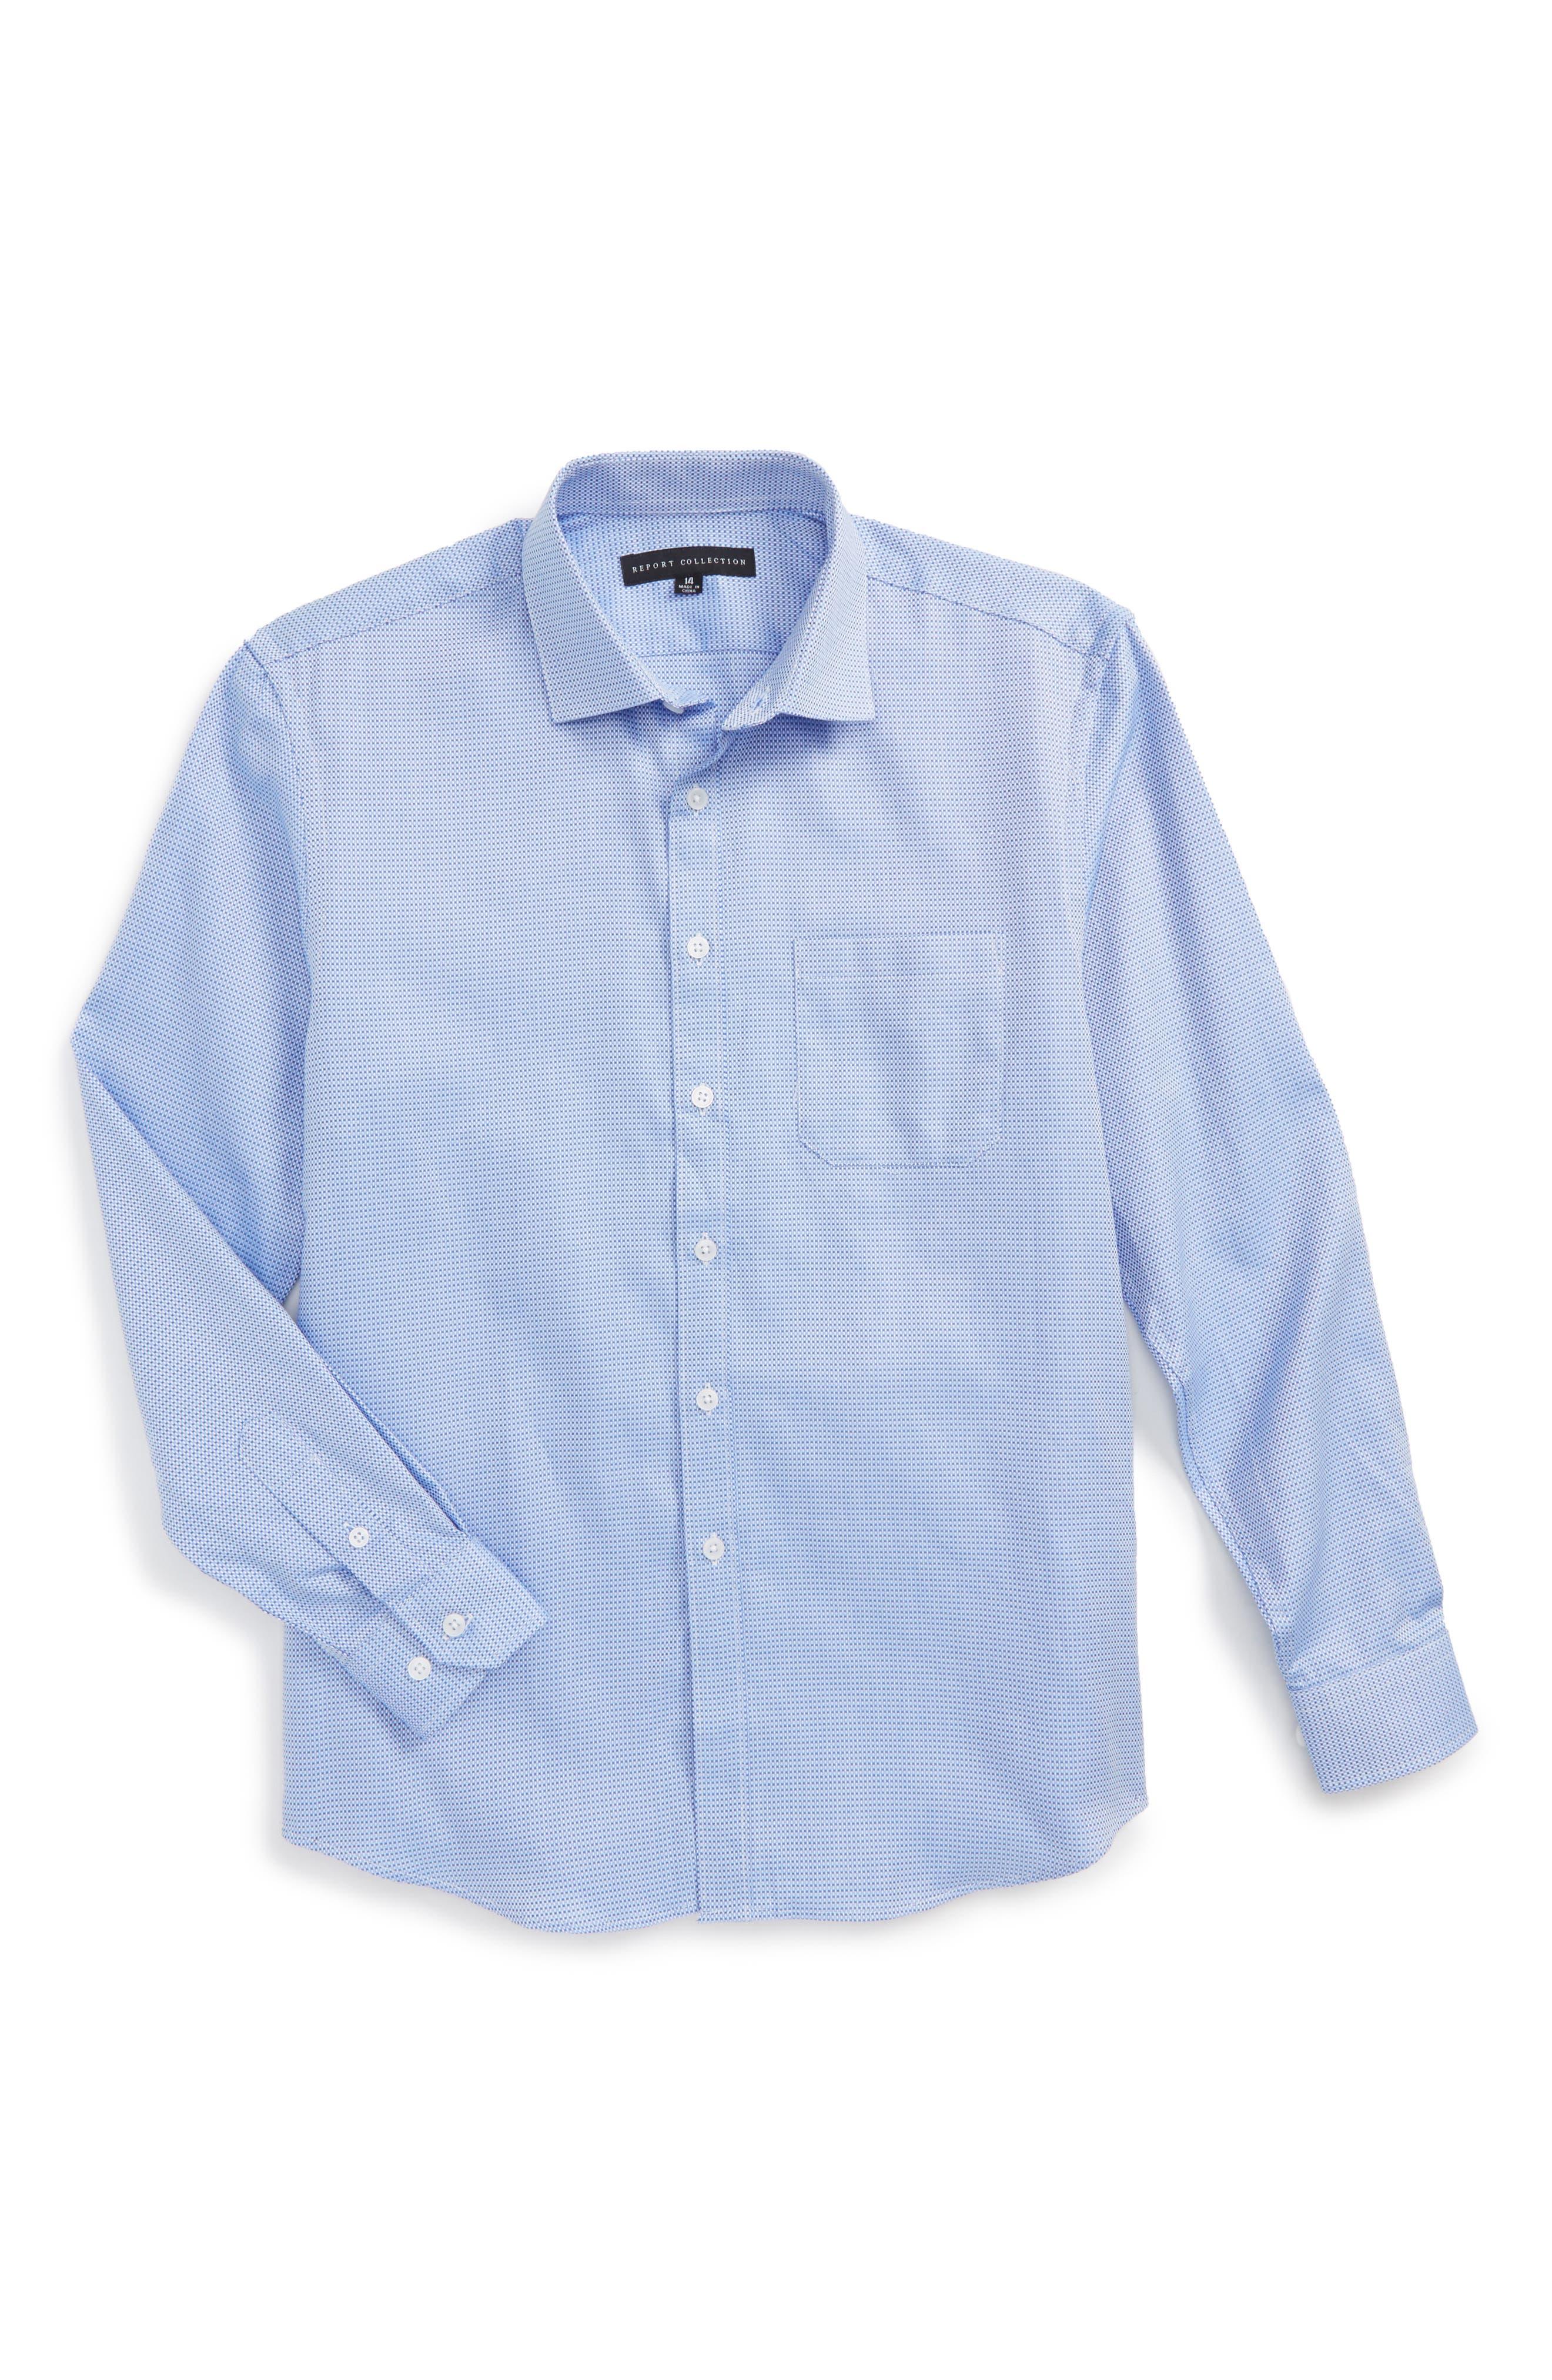 Alternate Image 1 Selected - Report Collection Textured Dress Shirt (Big Boys)